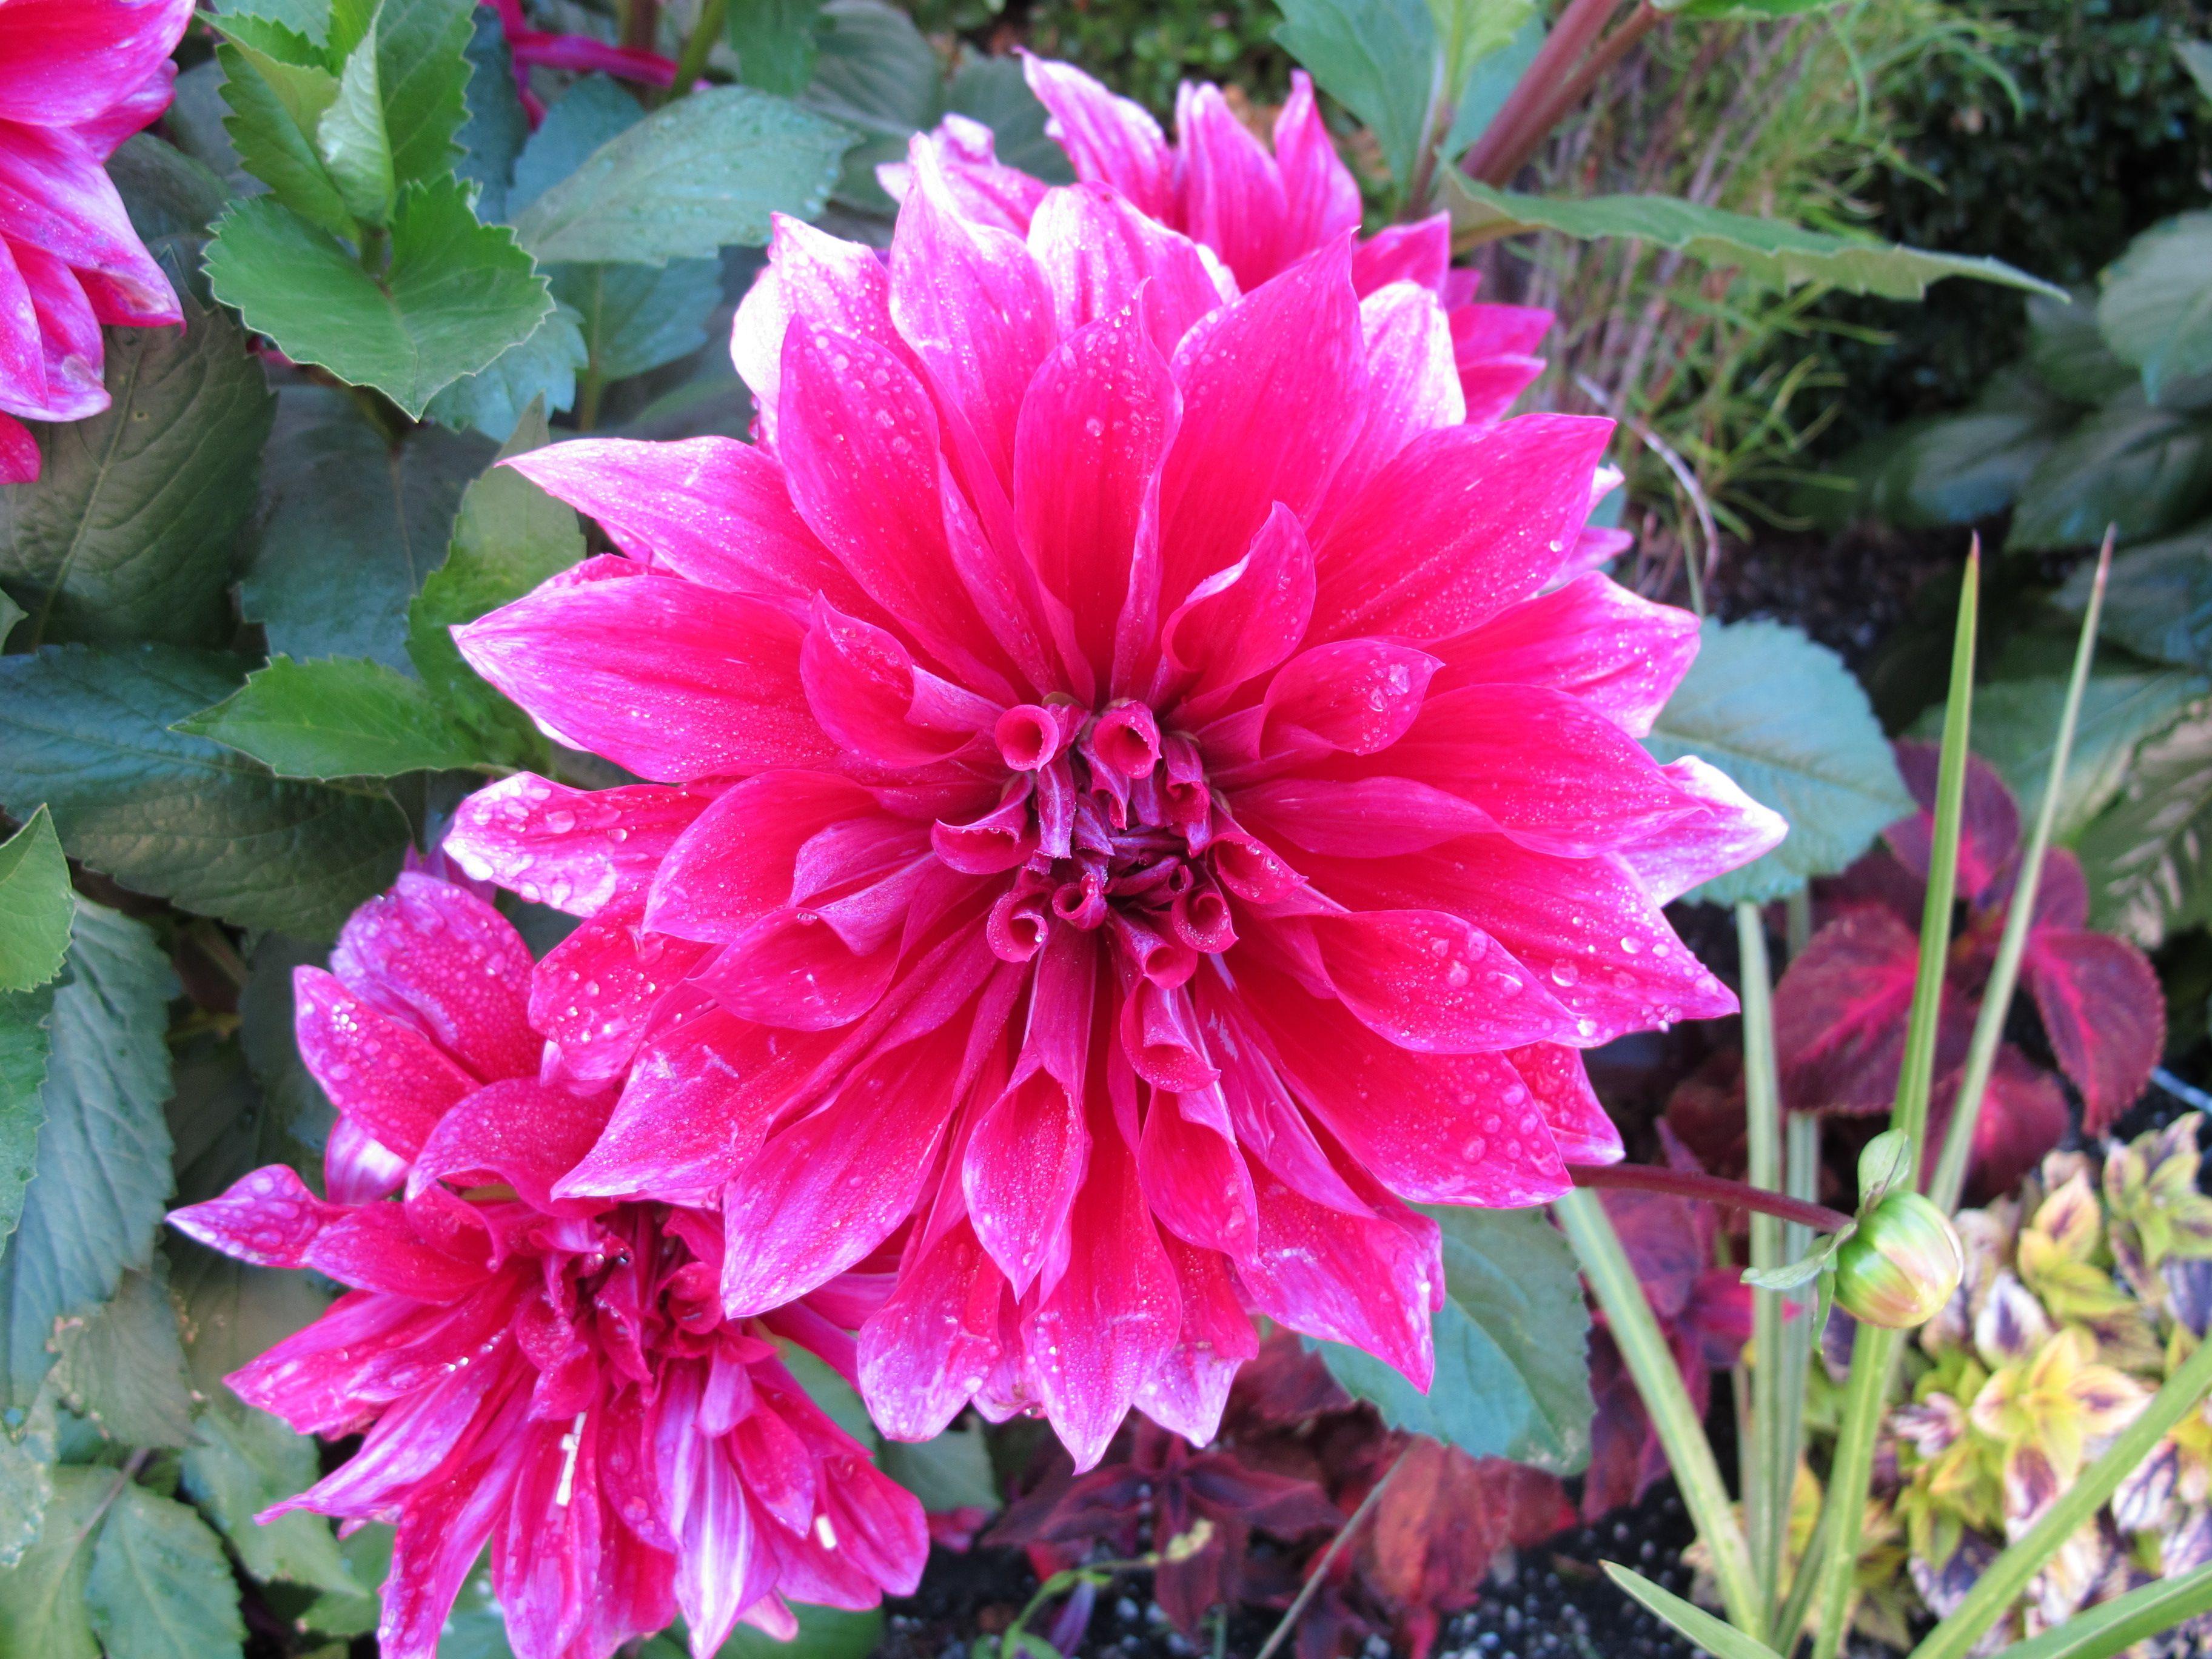 Dahlia atlanta florist flower delivery flowers garden